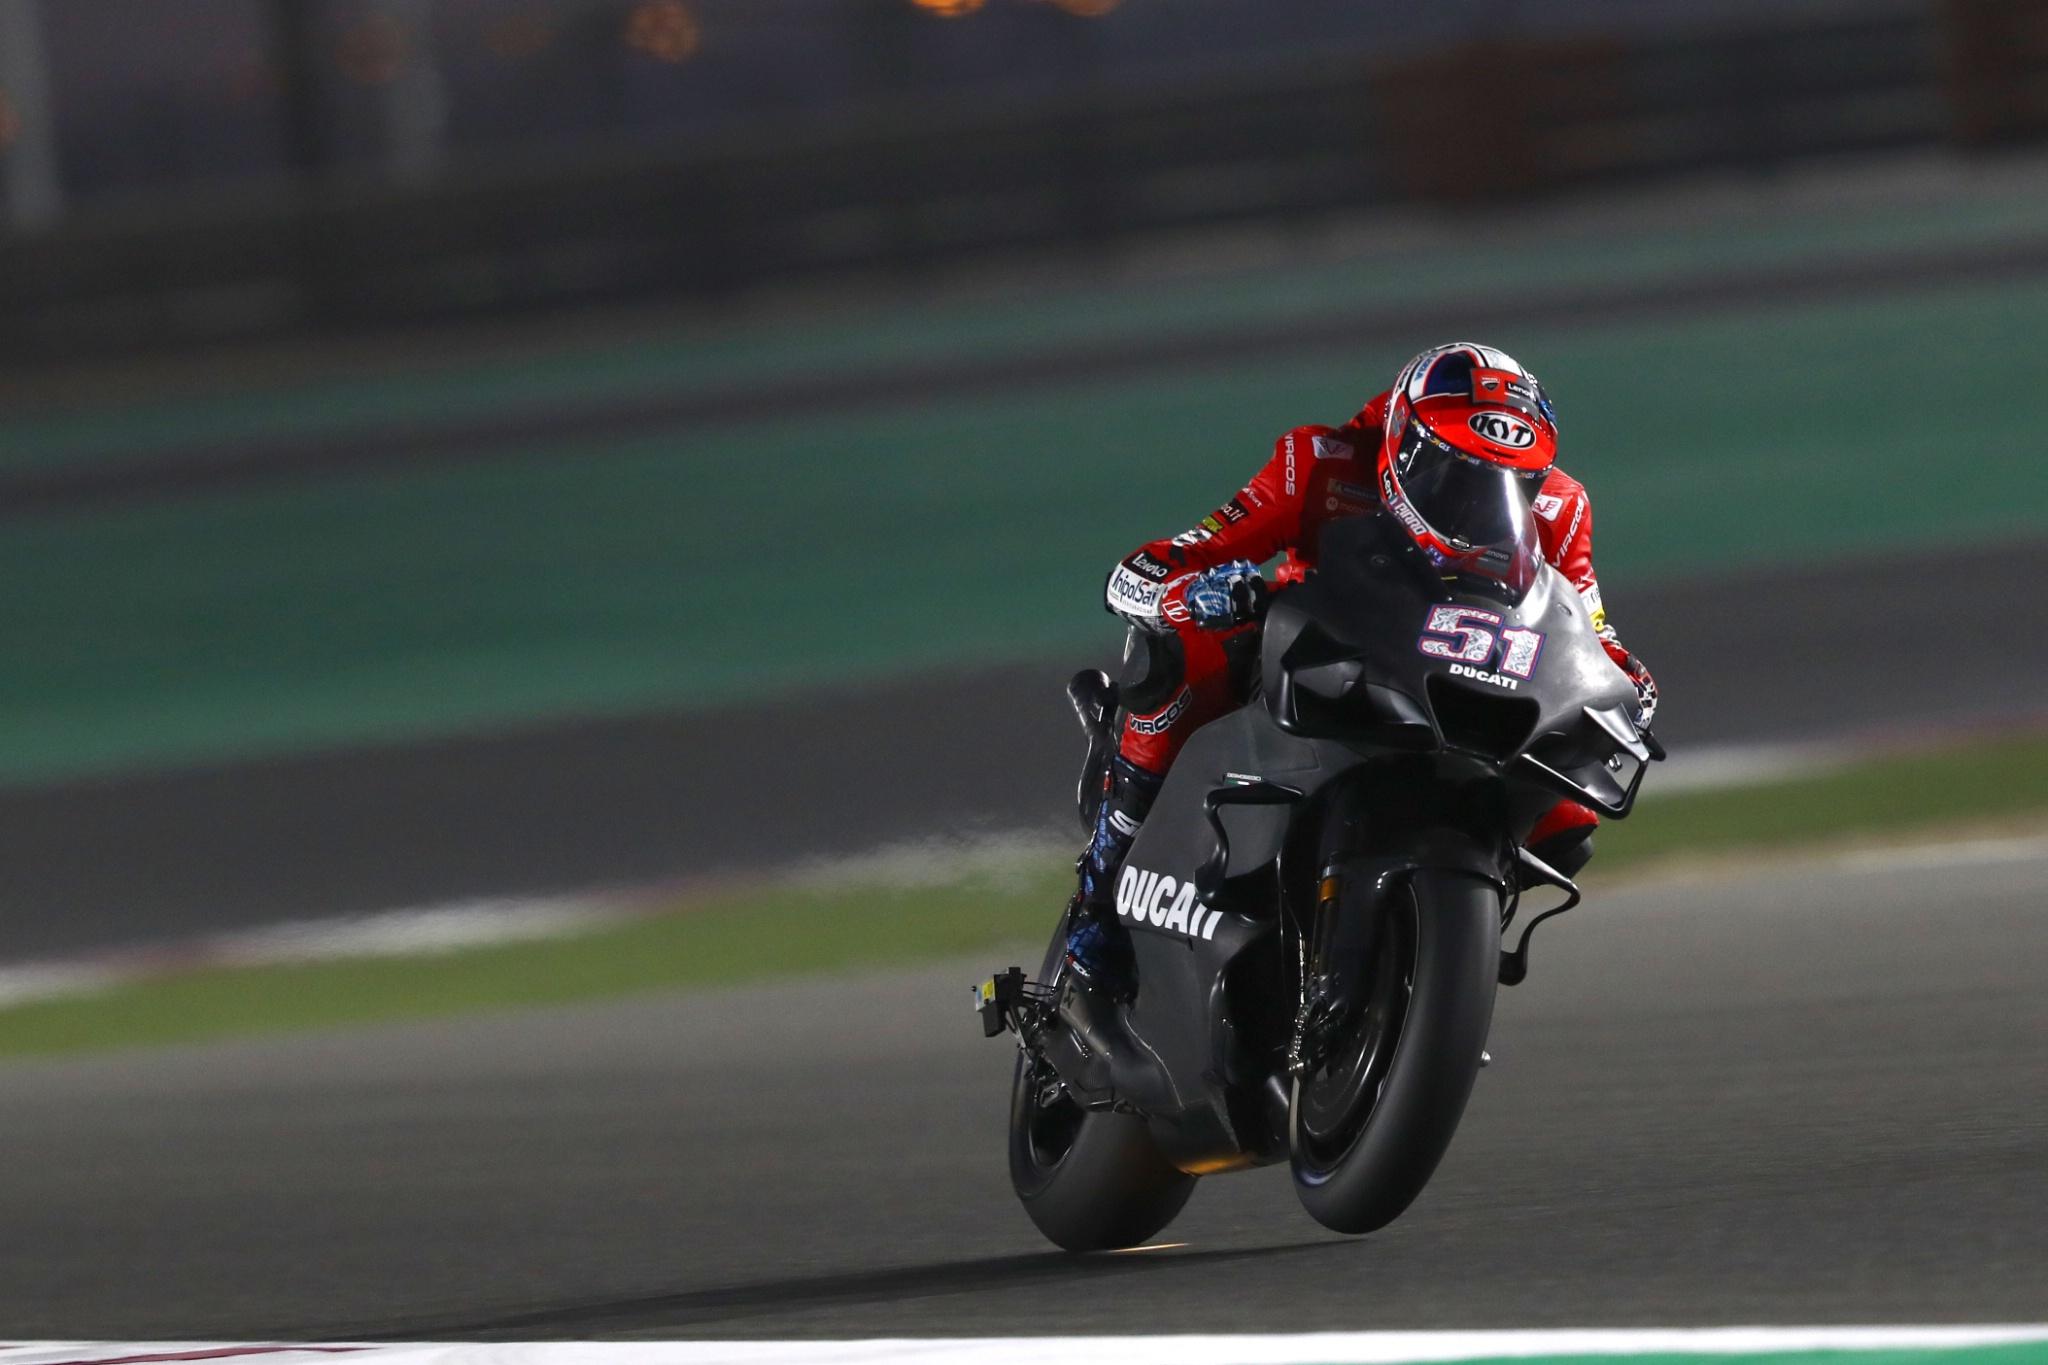 Michael Pirro, Qatar MotoGP test, 5 March 2021